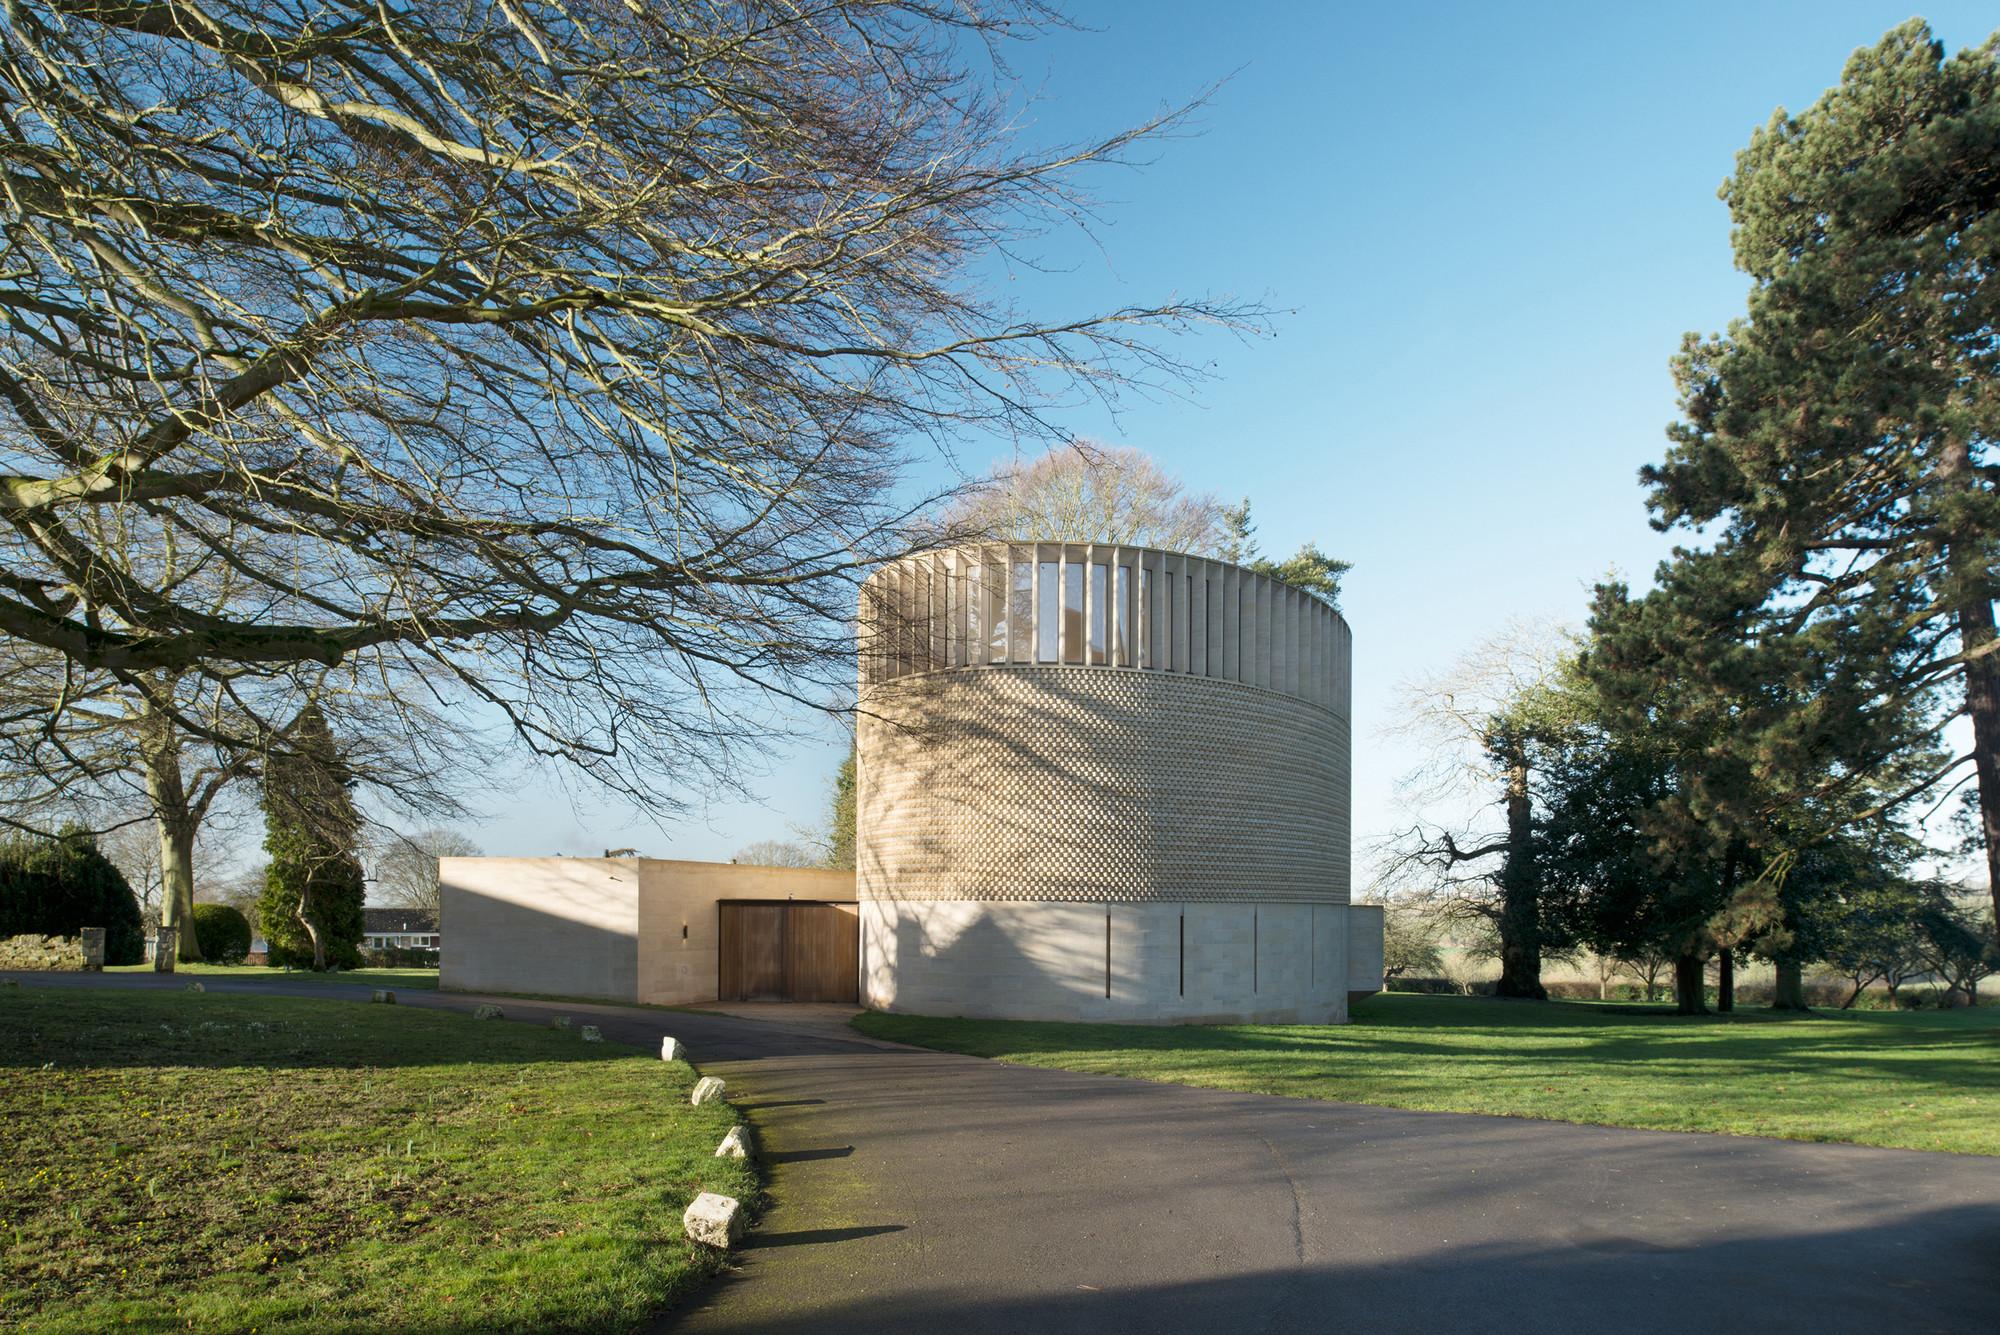 Capilla Obispo Edward King / Niall McLaughlin Architects, © NAARO